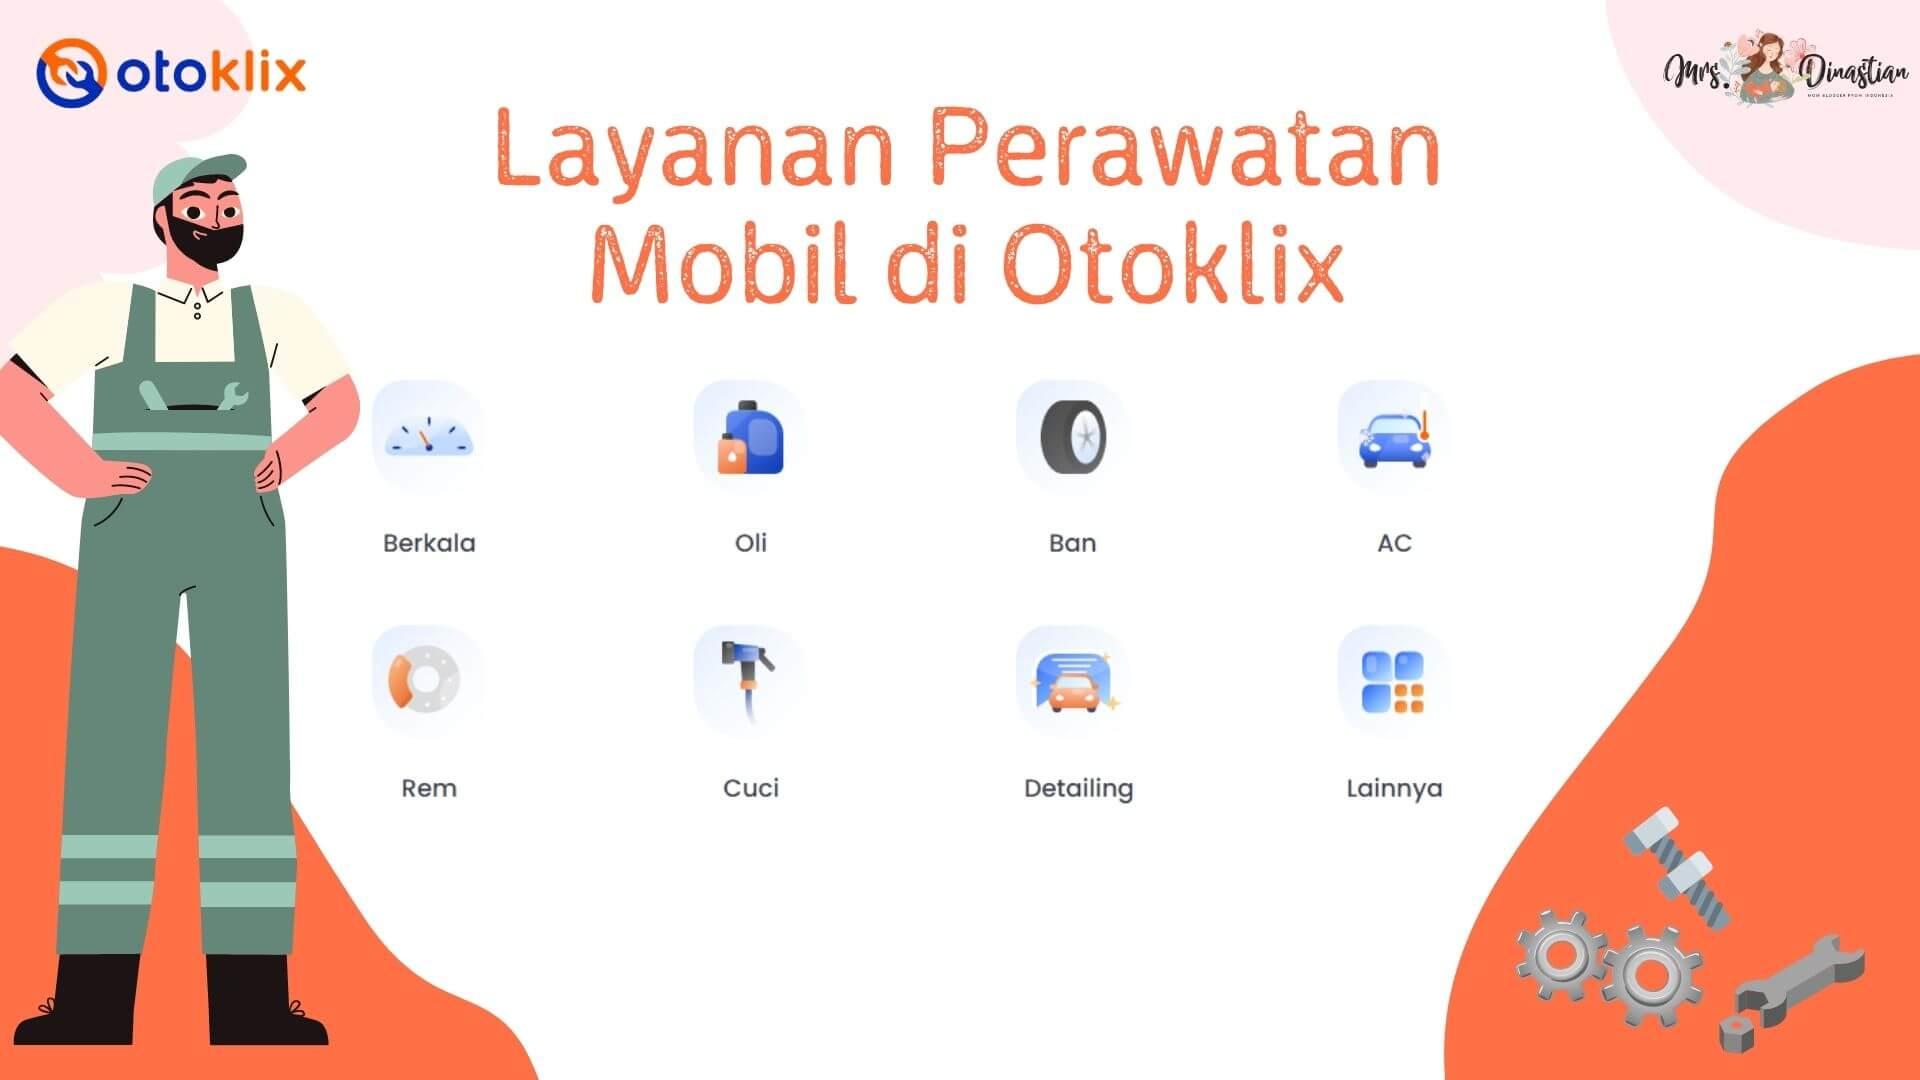 Layanan Perawatan Mobil Otoklix